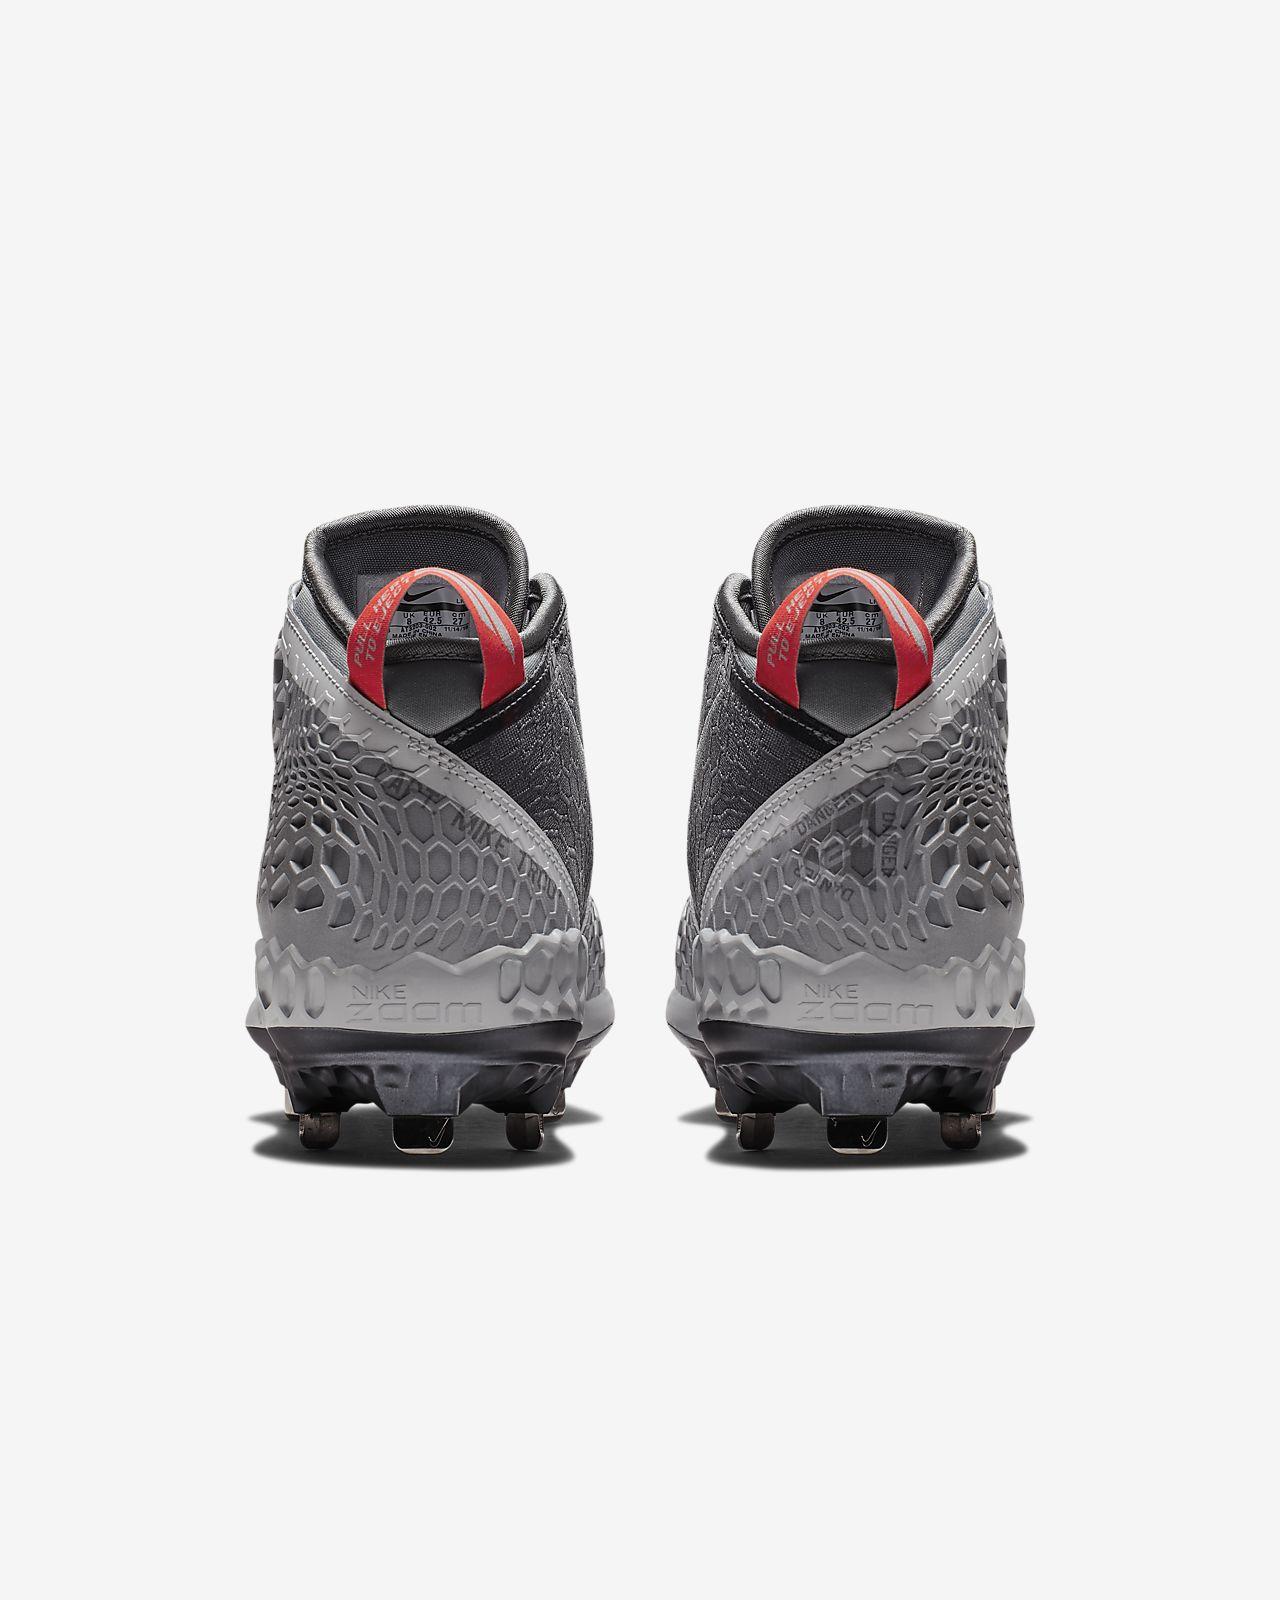 221e543d71f24 Nike Force Zoom Trout 5 MIV Baseball Cleat . Nike.com